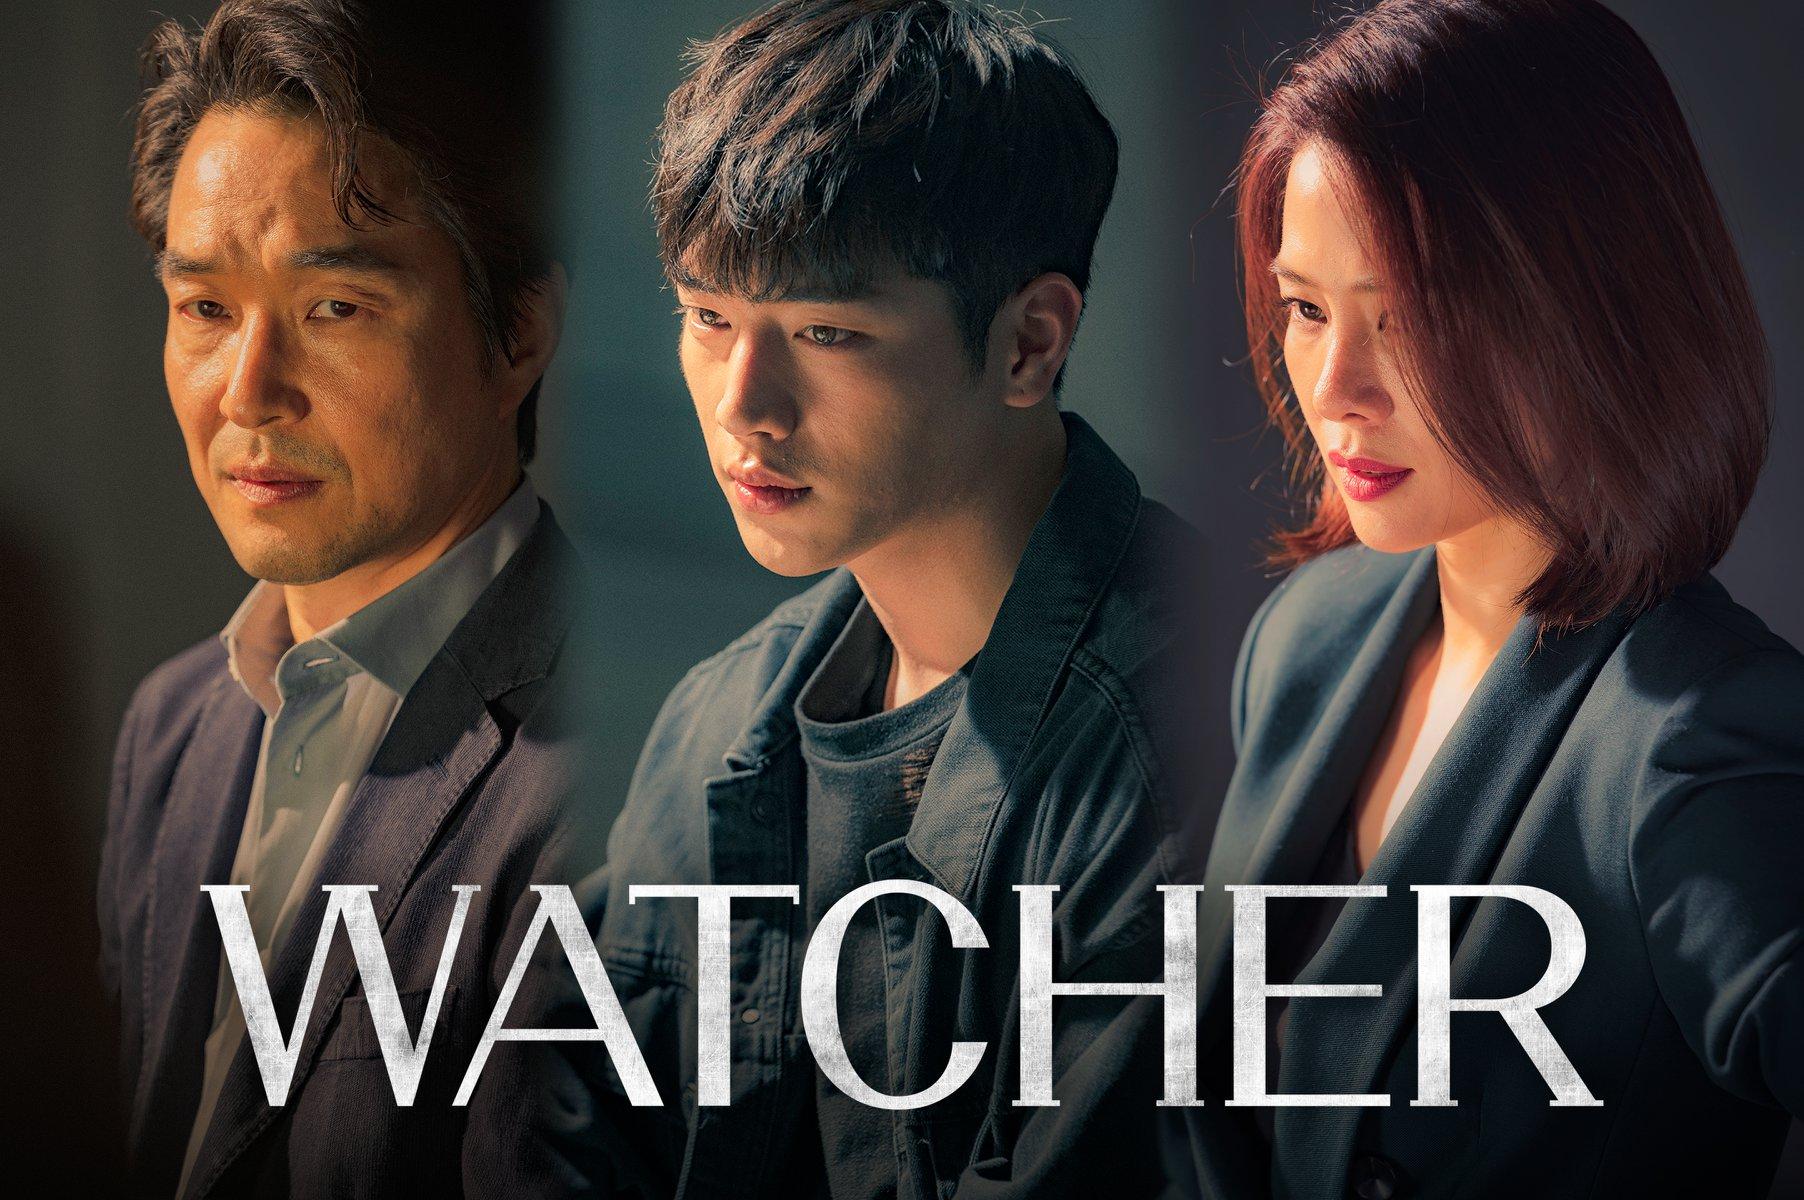 Watcher drama, Watcher ocn, Watcher summary, Watcher cast, watcher seo kangjoon